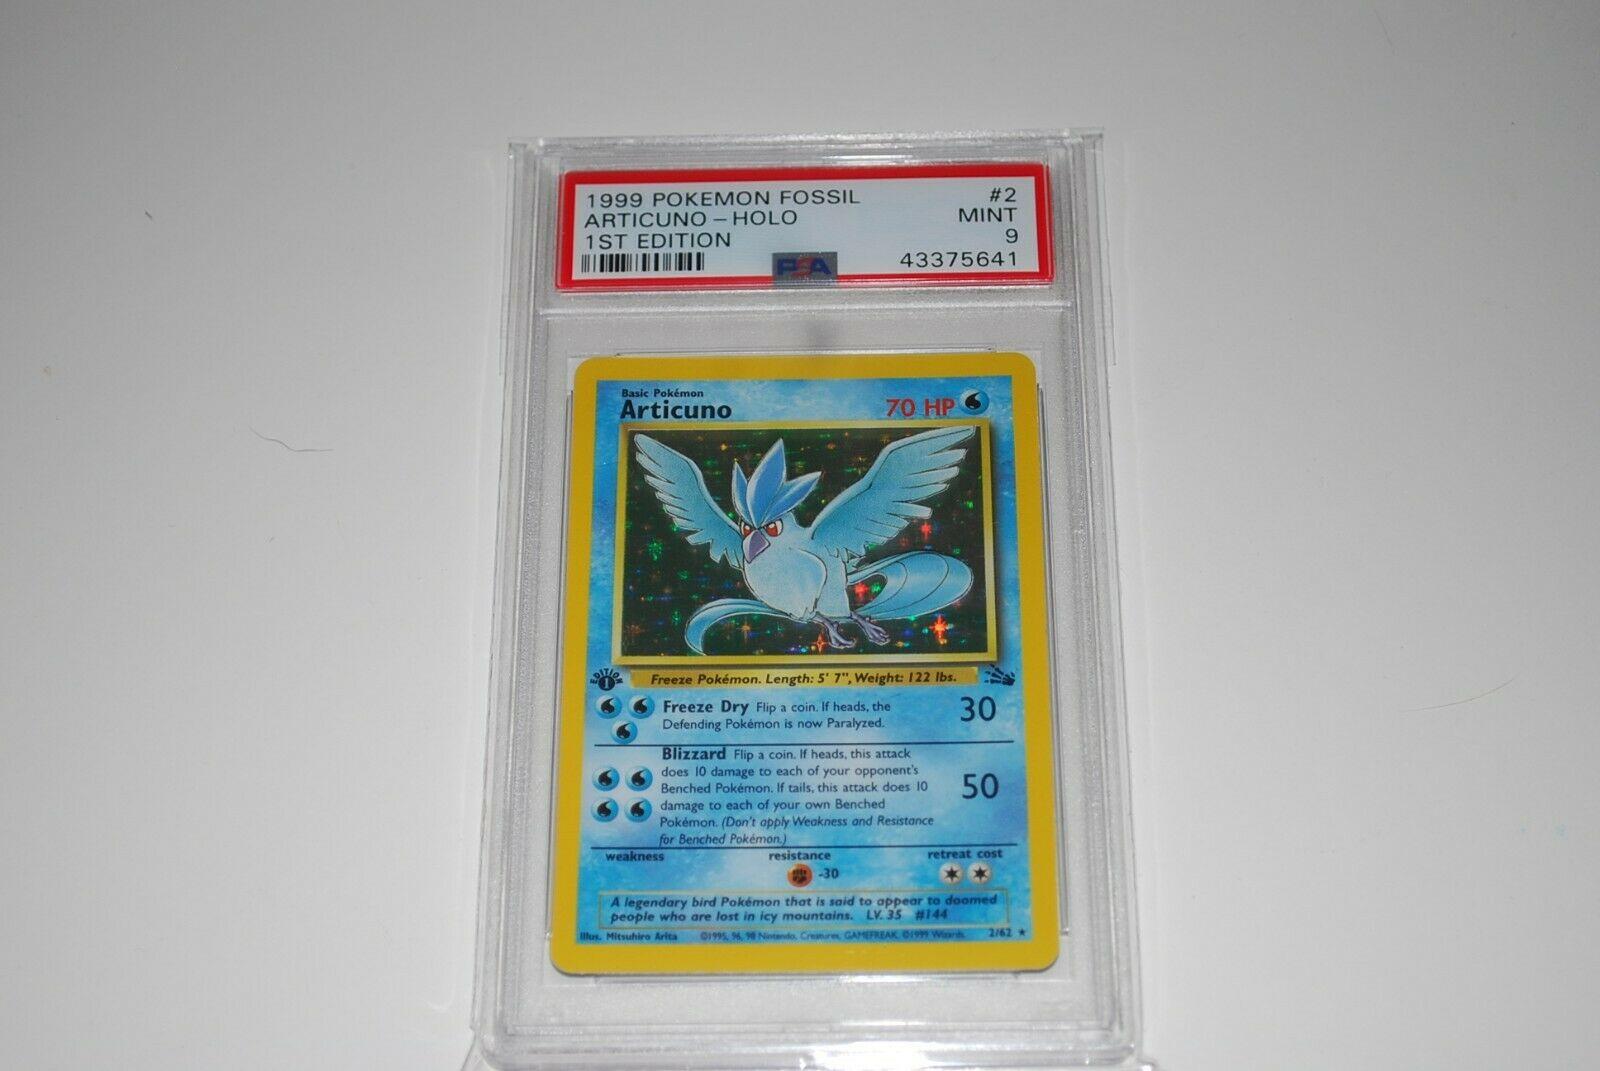 PSA 9 Mint 1st Edition Articuno Holo 262 Fossil Pokemon Card 1999